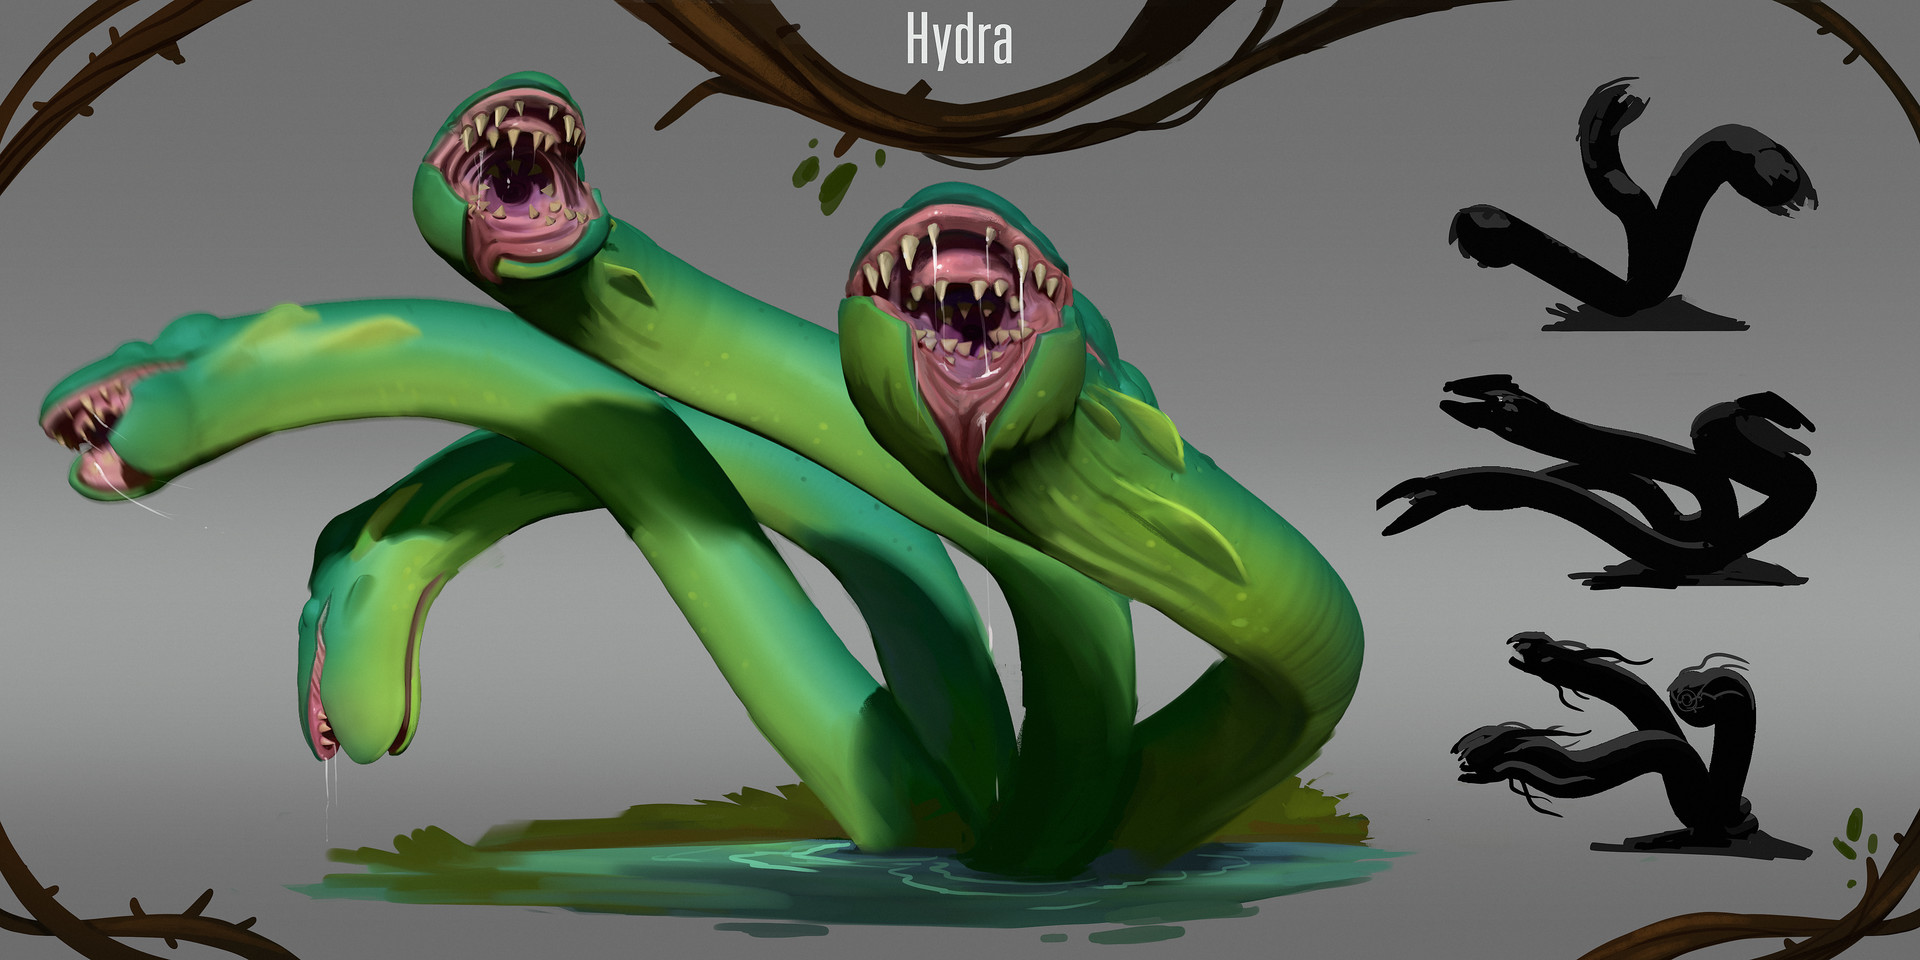 Tim kaminski creature swampy forest hydra no text